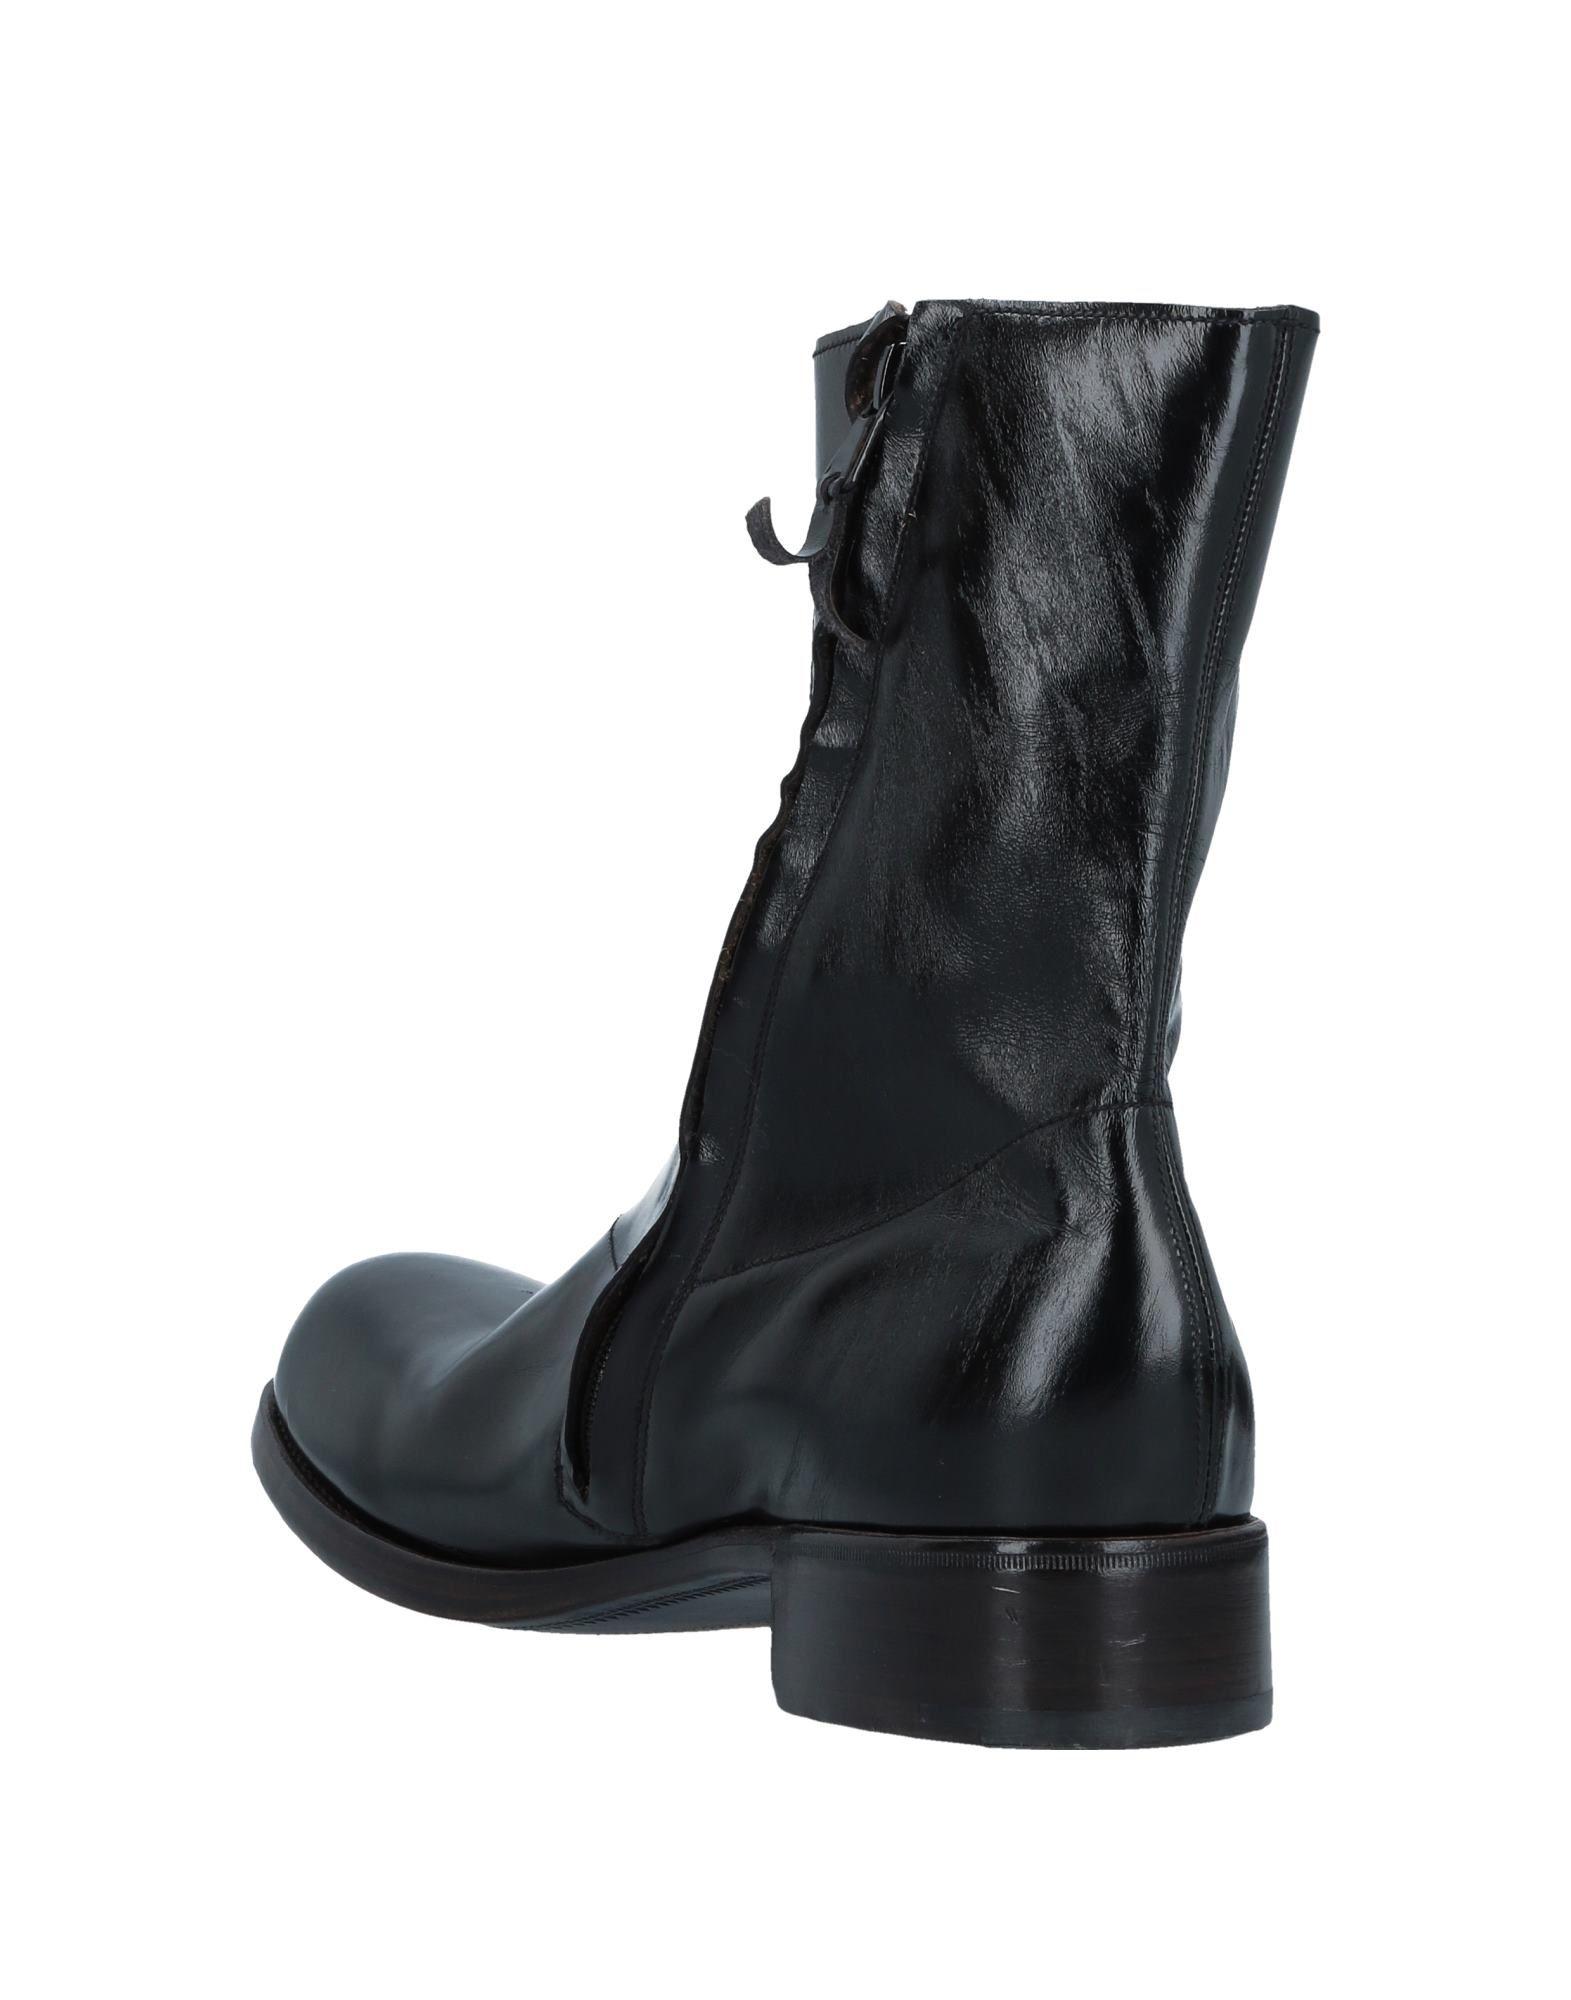 Premiata Stiefelette Herren  Schuhe 11529644PU Gute Qualität beliebte Schuhe  6a32c1